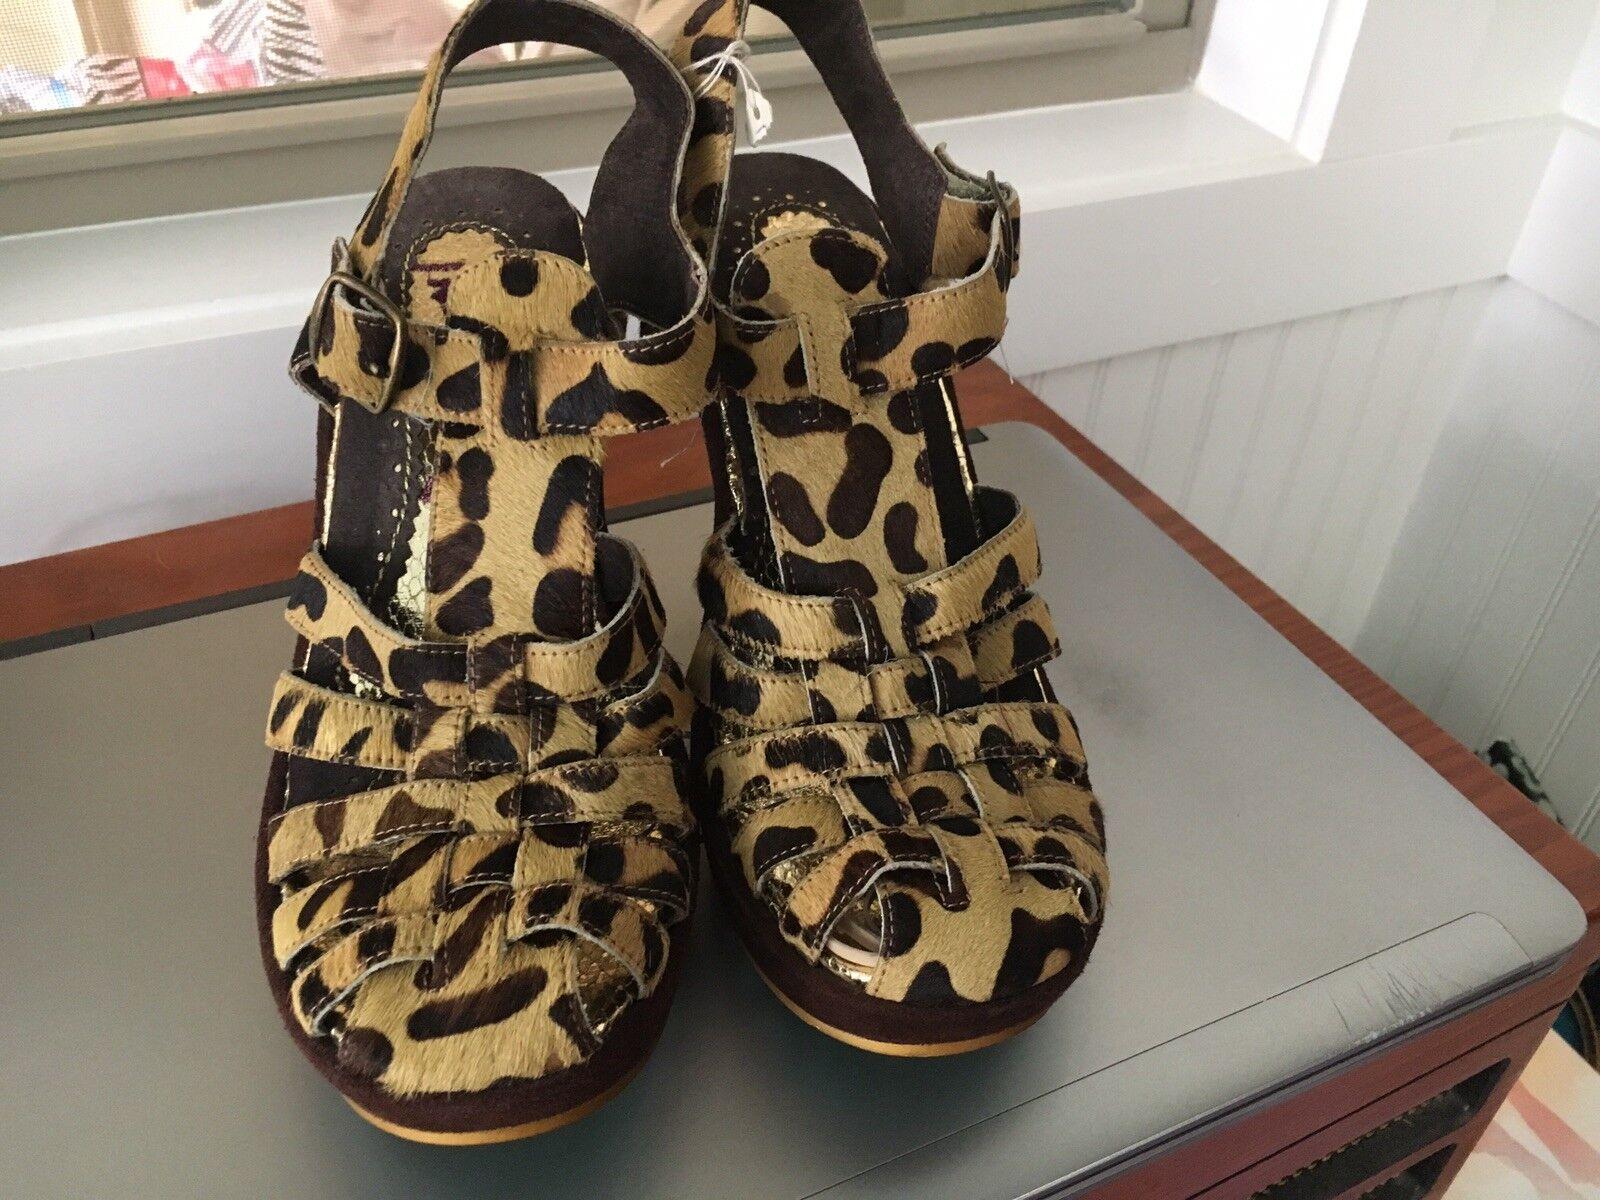 Nuevo Sin Caja Irregular Choice Leopardo Zapatos 6 1 2